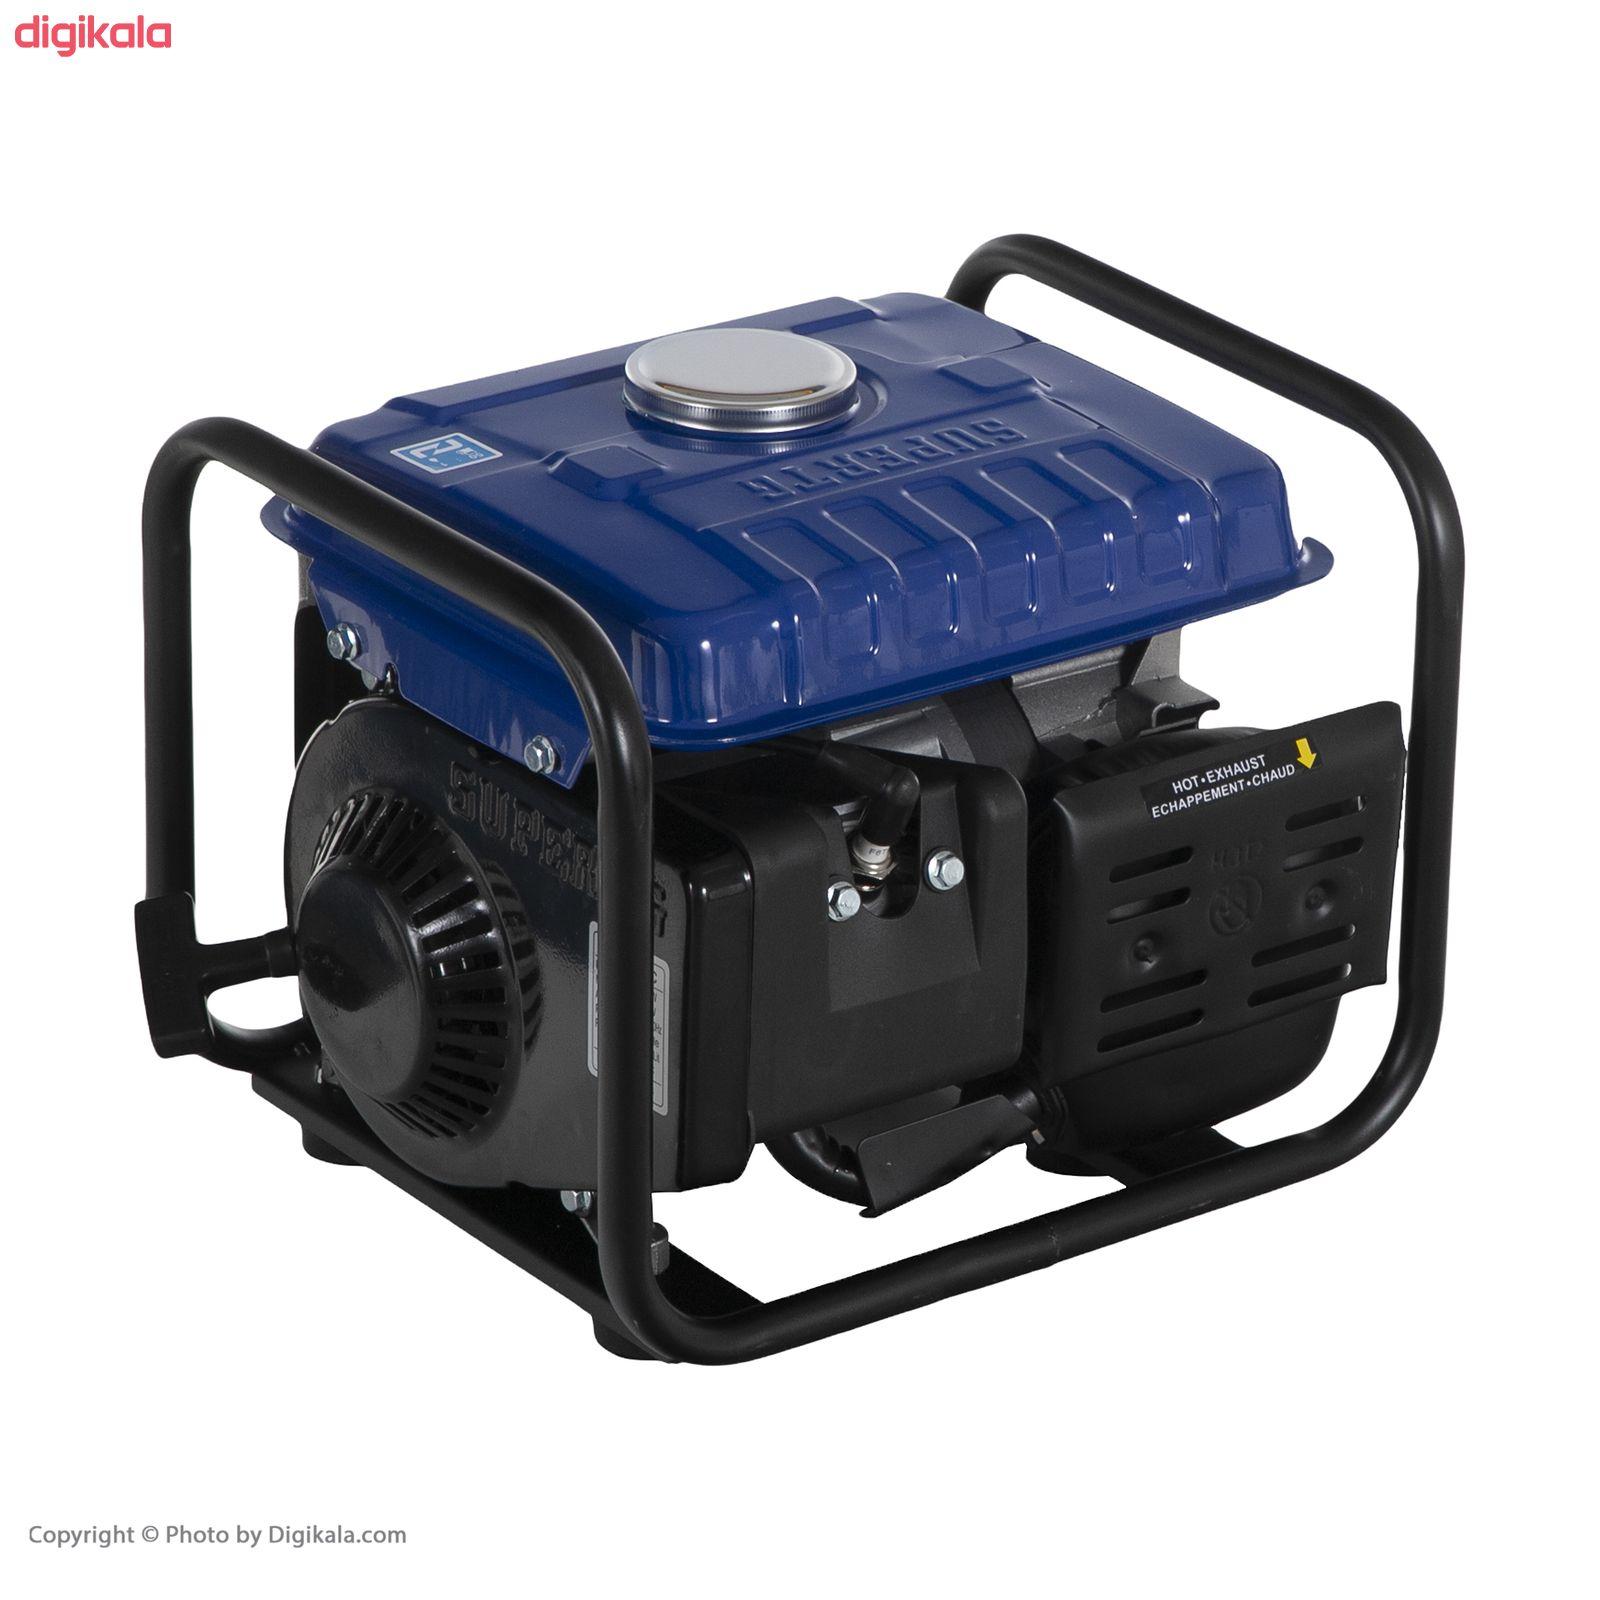 موتور برق سوپر تی جی مدل TG2500DC main 1 2